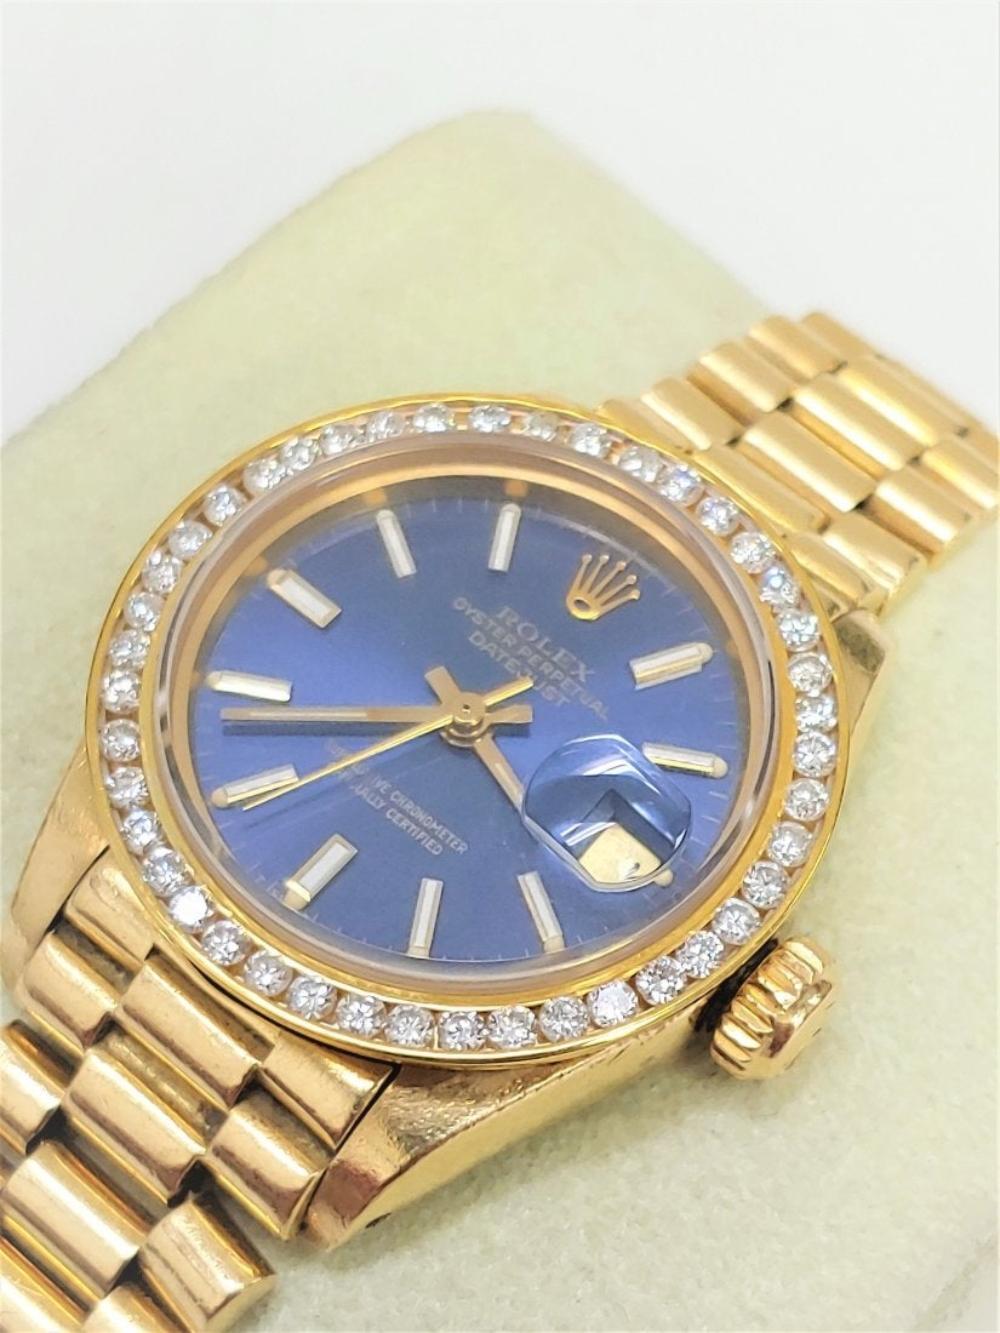 Lot 185: Womens Rolex Presidential Blue Dial 18k Diamonds Watch